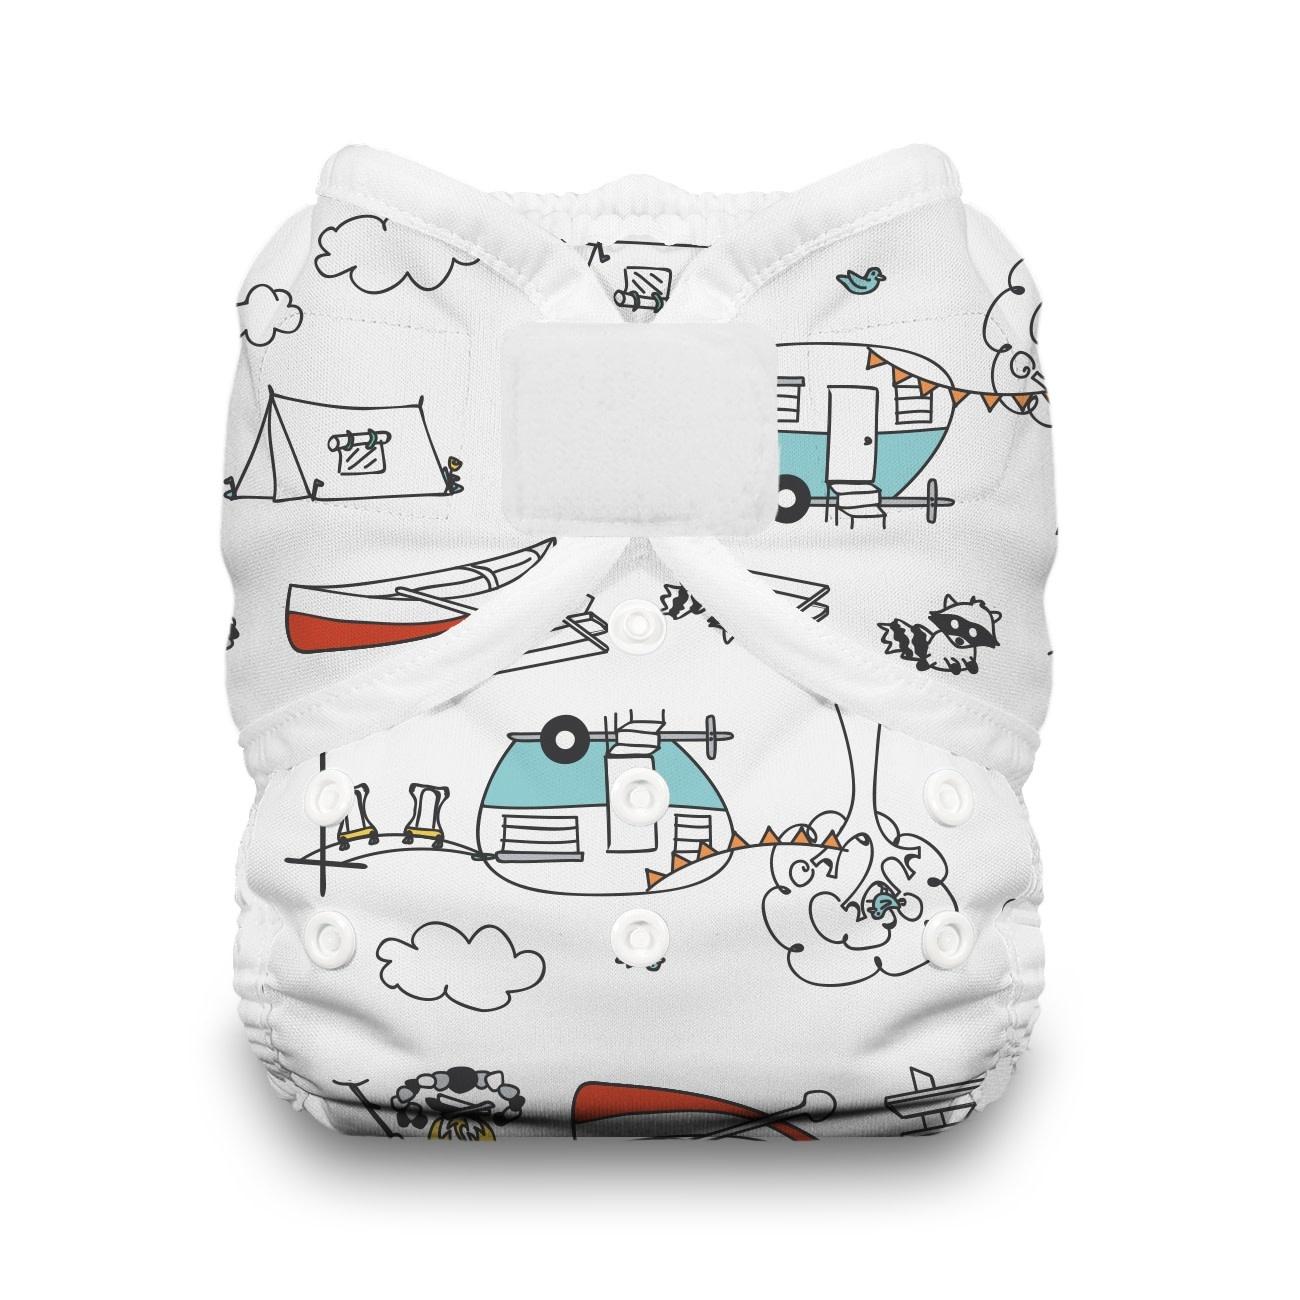 Thirsties Thirsties Duo Wrap size 1 H&L Happy Camper